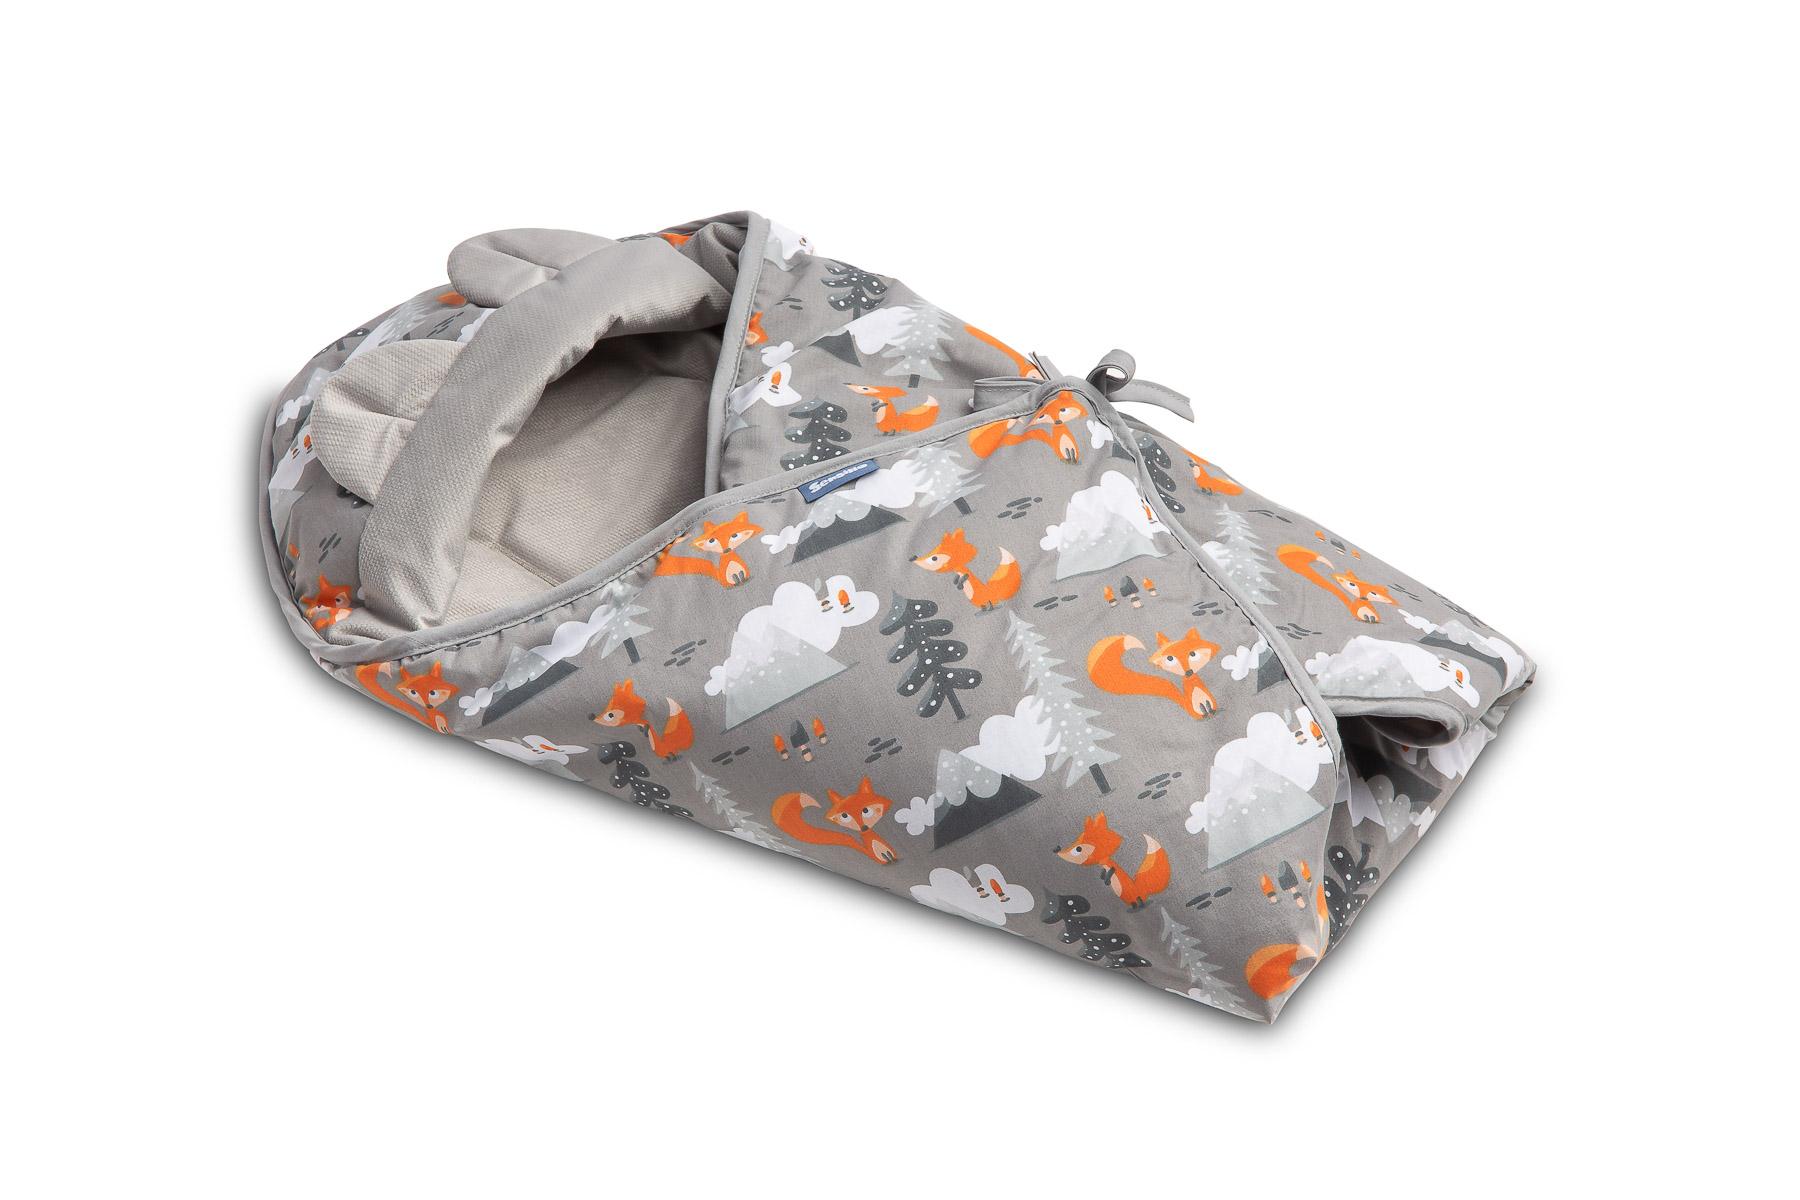 Velvet carry-cot swaddle blanket – grey mountains